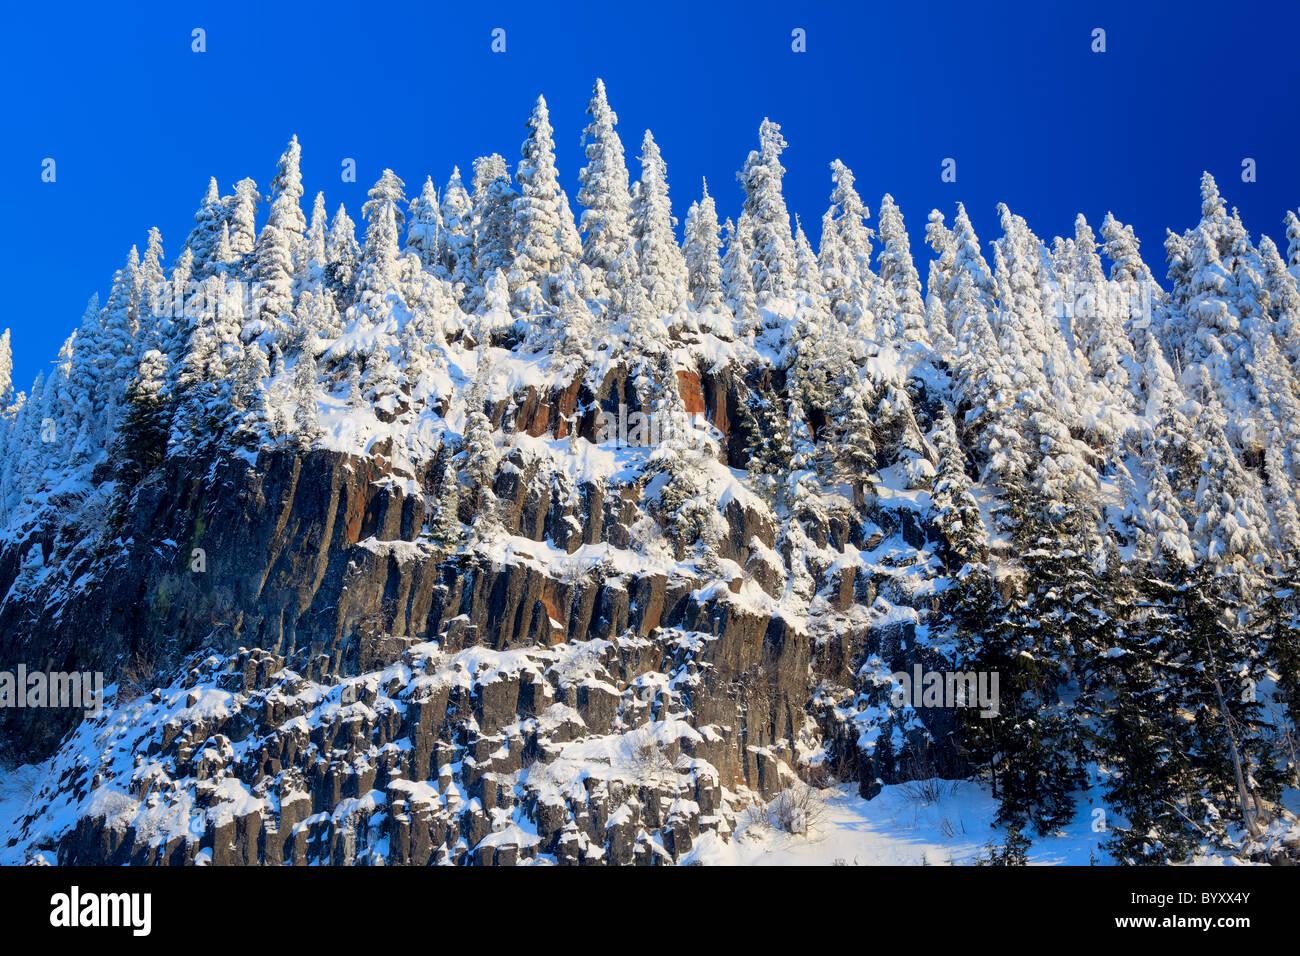 Bäume in Mount Rainier Nationalpark mitten im Winter gefroren Stockbild